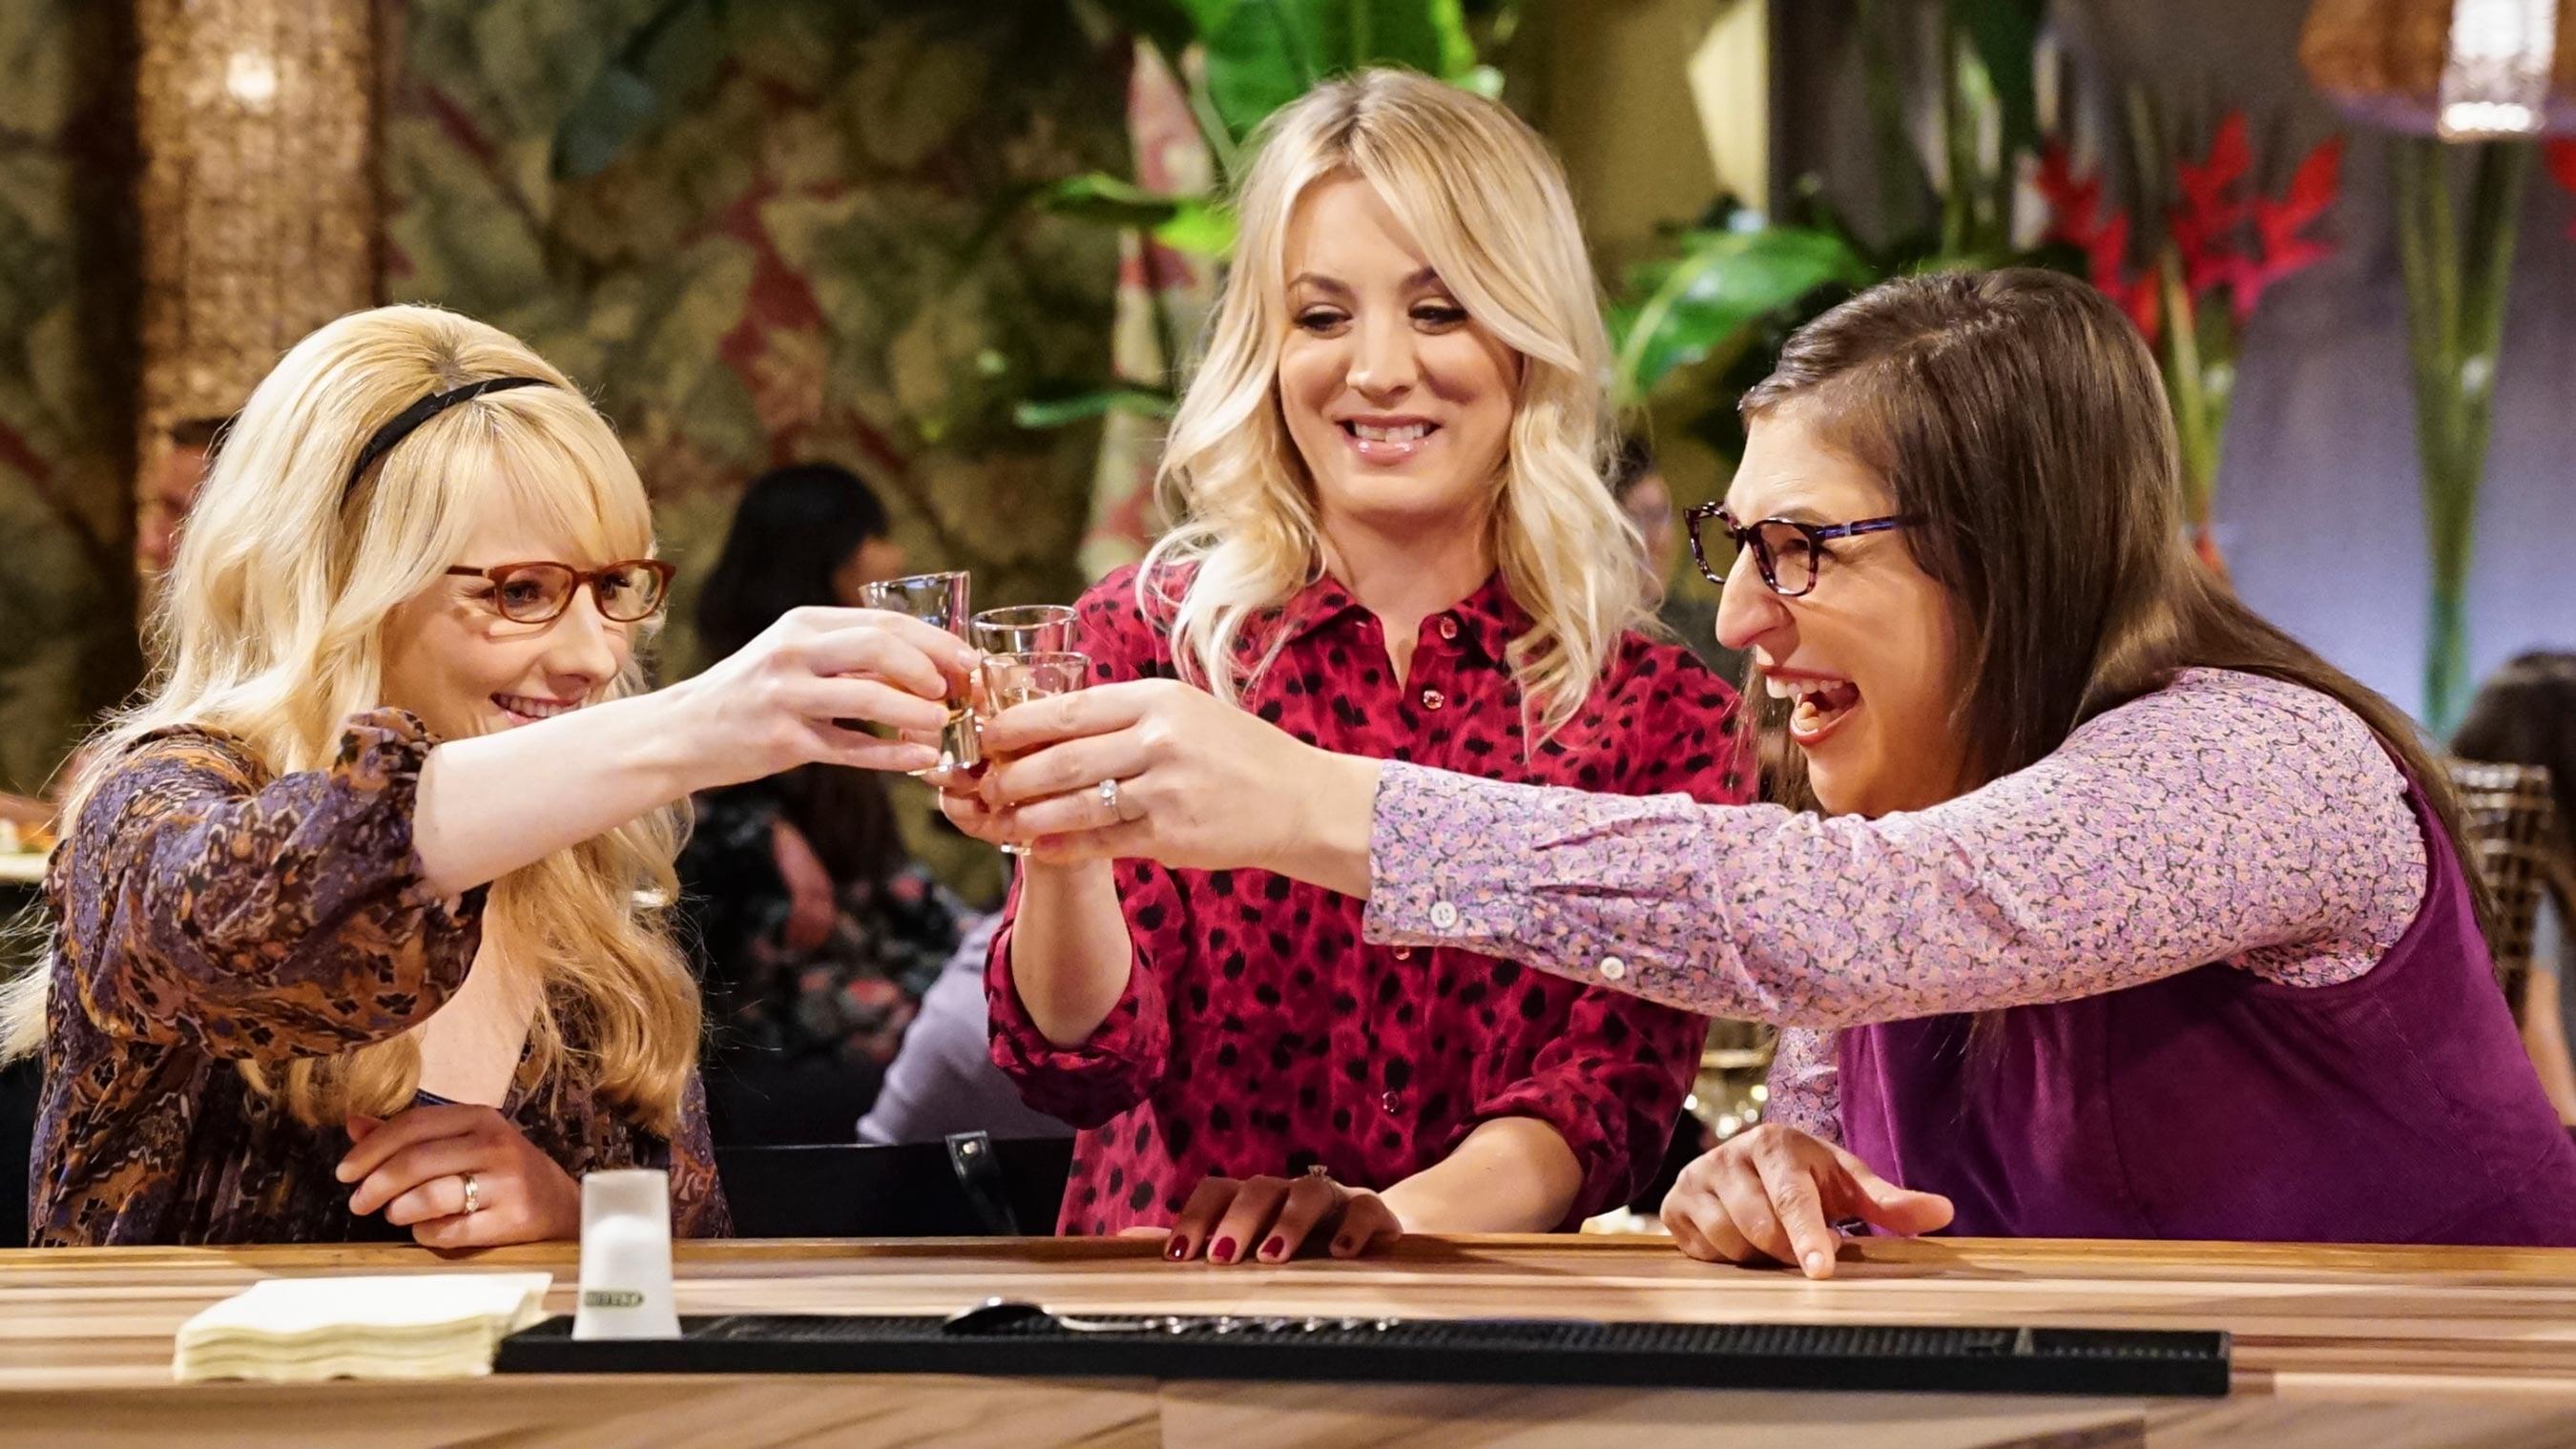 The Big Bang Theory Season 11 : The Reclusive Potential